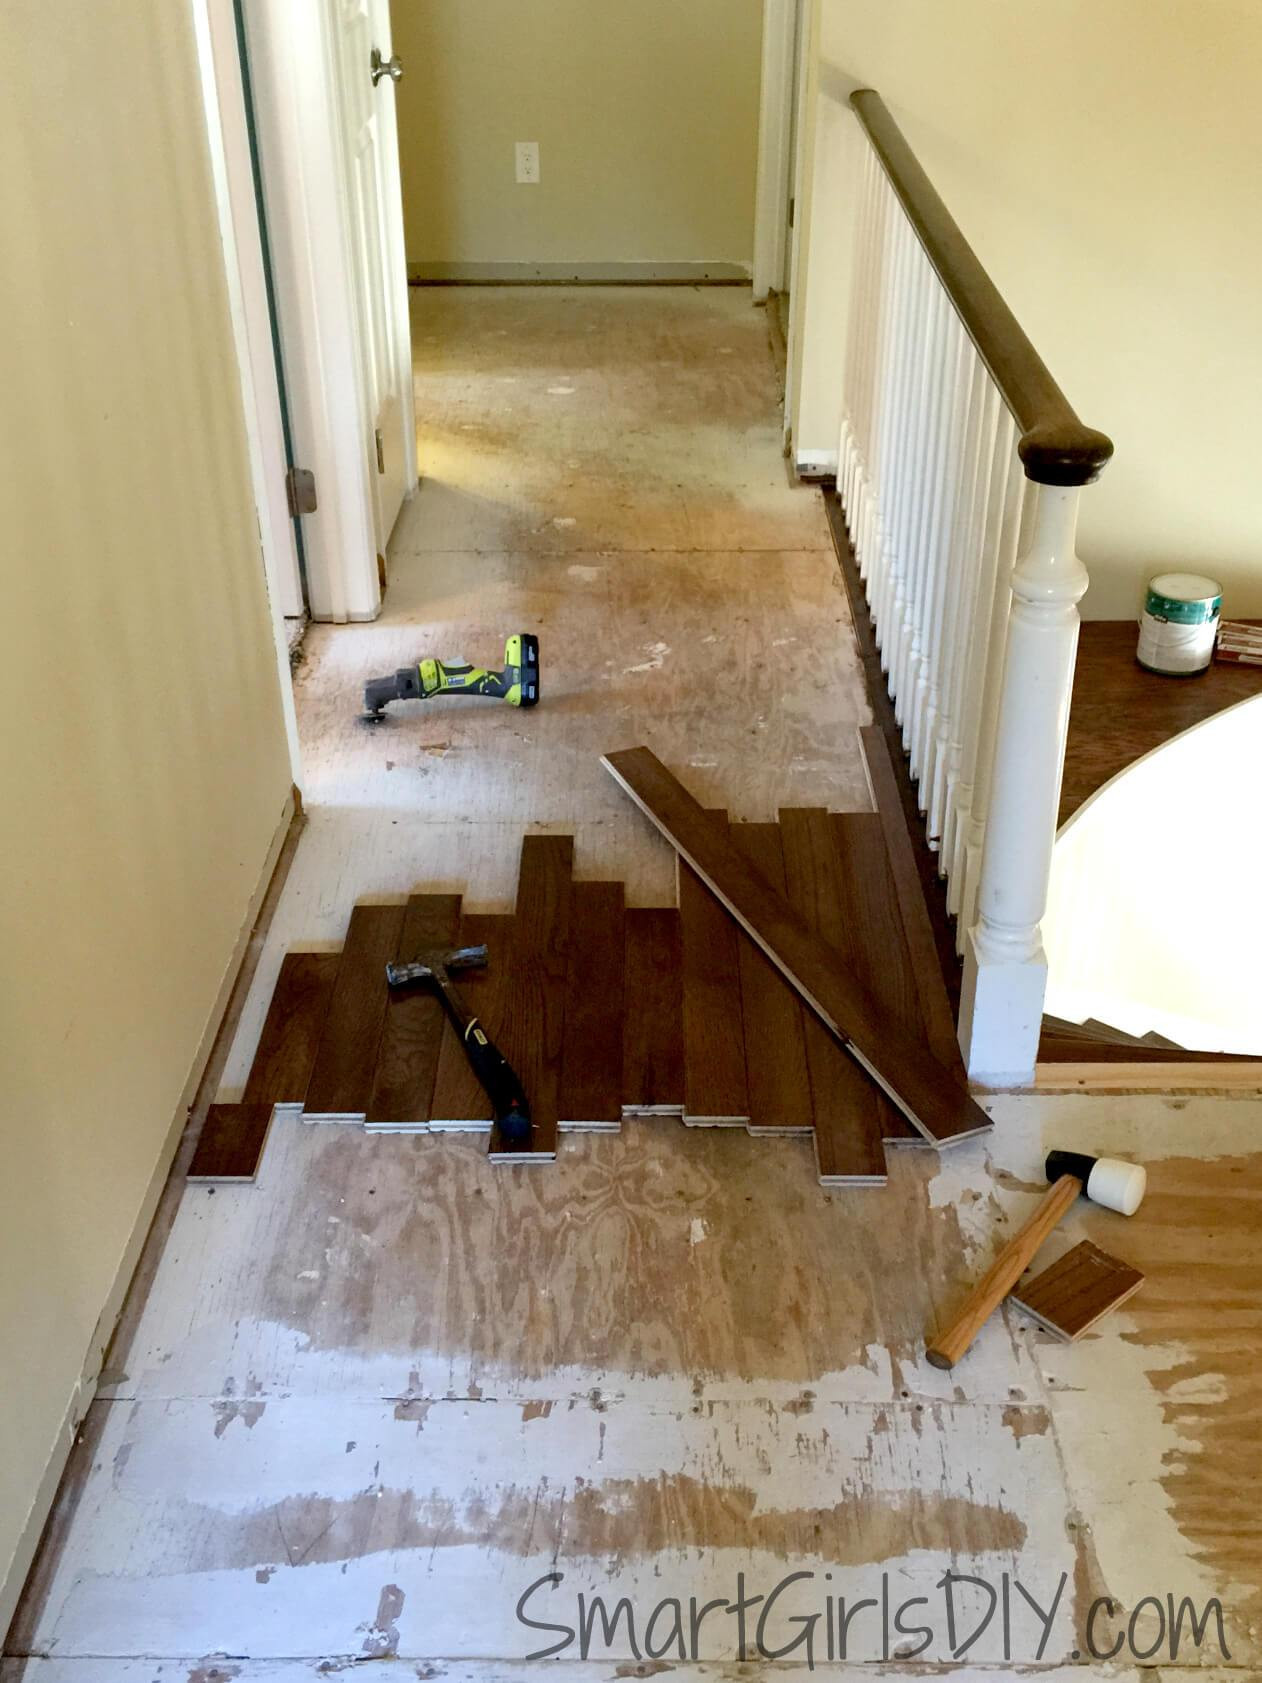 floor nailer for 3 8 engineered hardwood of upstairs hallway 1 installing hardwood floors with regard to laying out bruce hardwood flooring